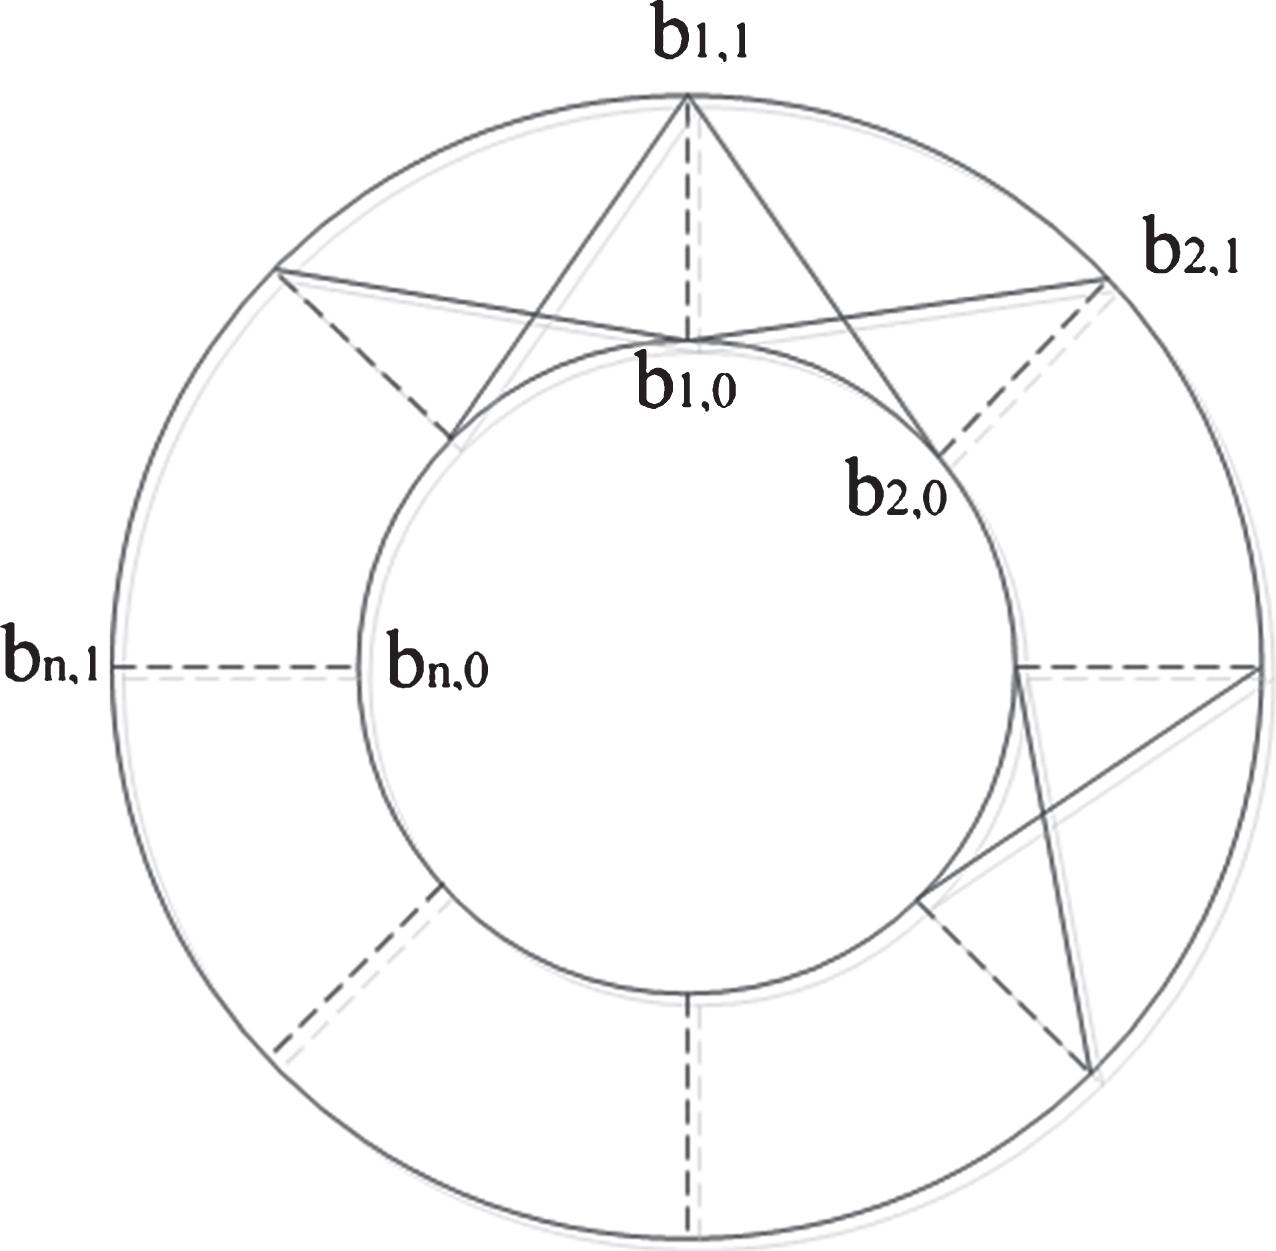 The Management Model Of Construction Plane Layout Based On Pareto